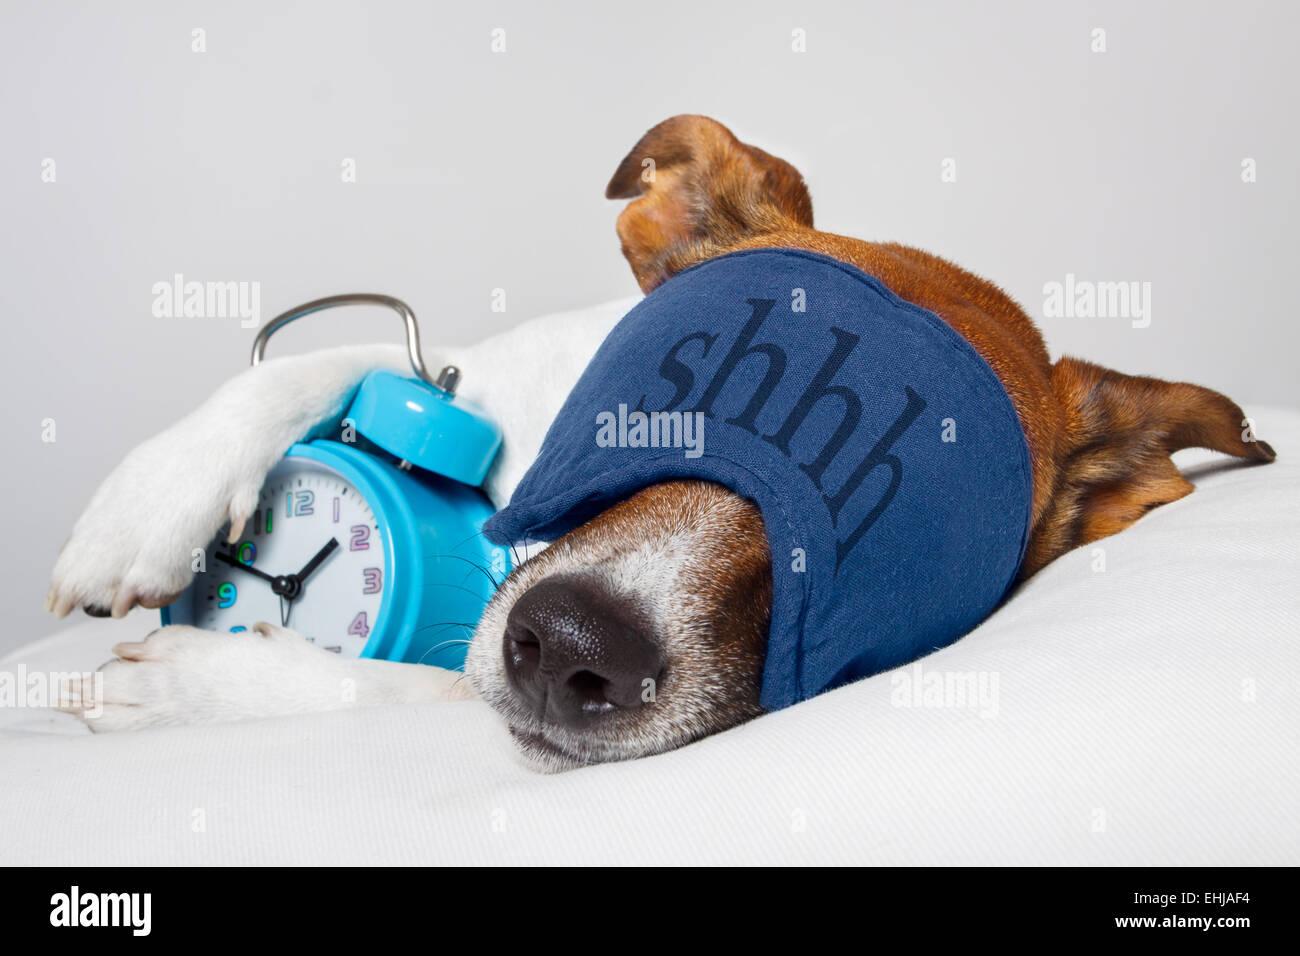 Dog sleeping with alarm clock and sleeping mask - Stock Image